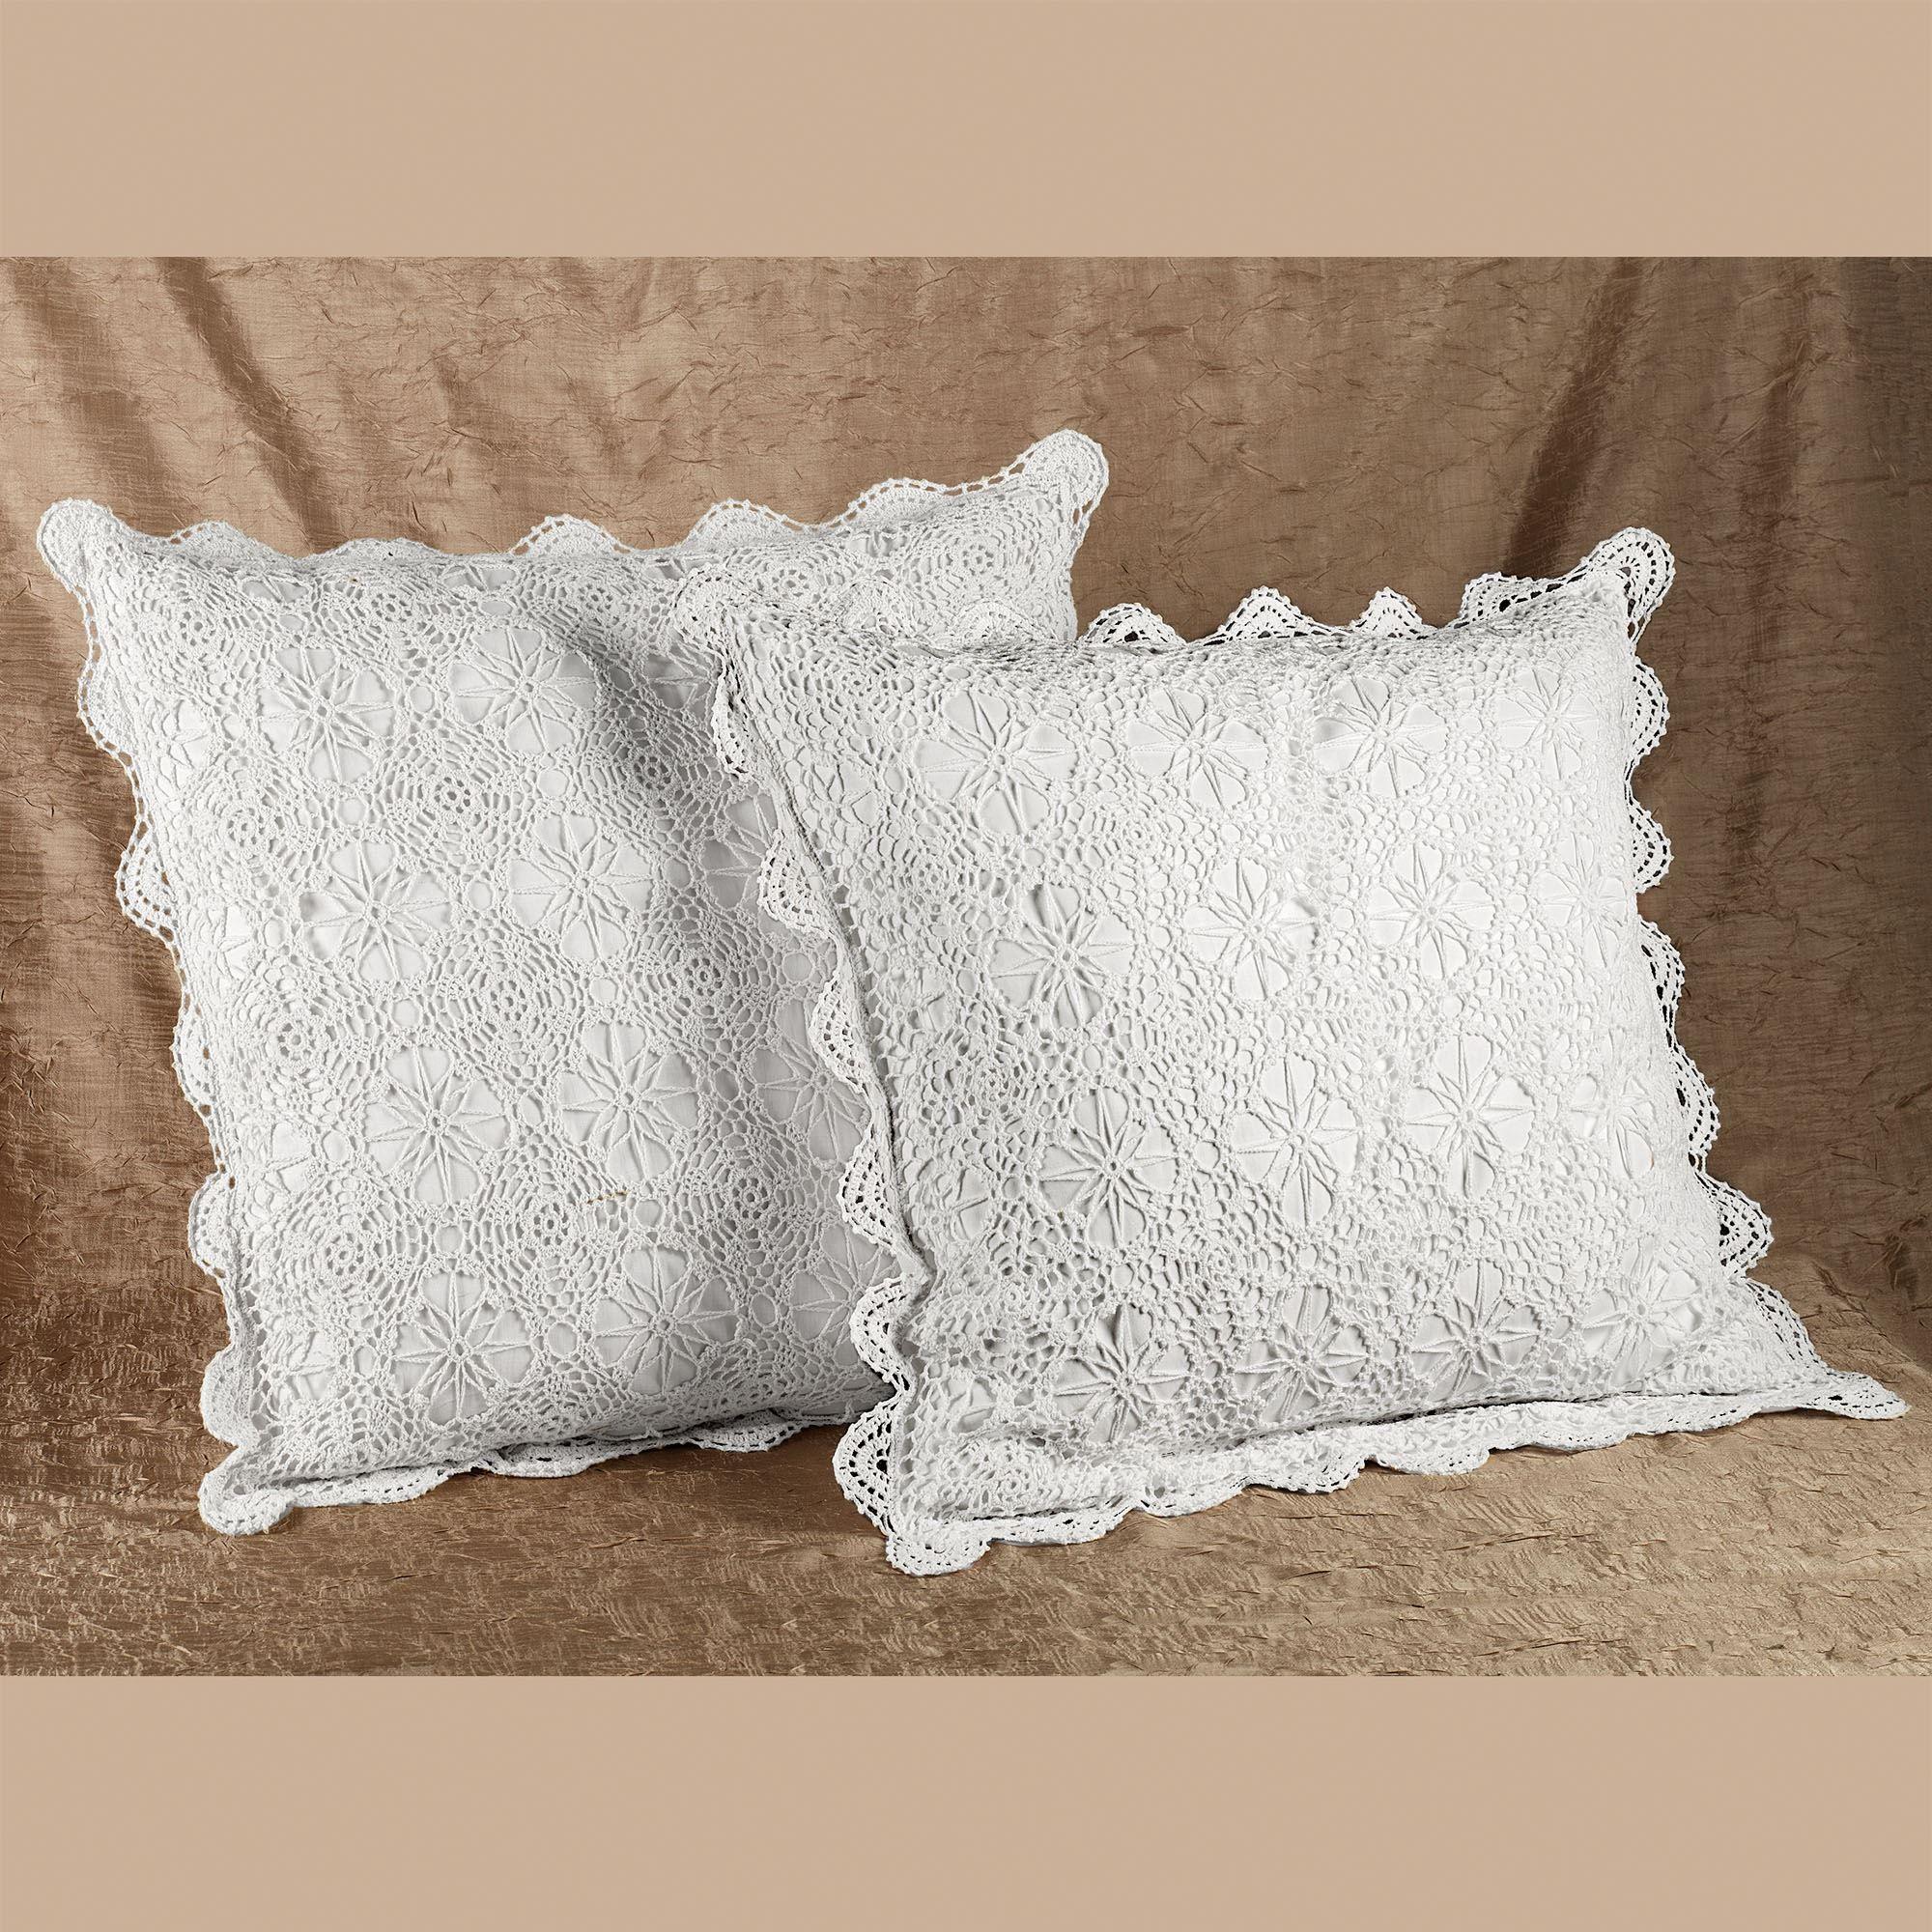 Crochet Bedskirts And Shams